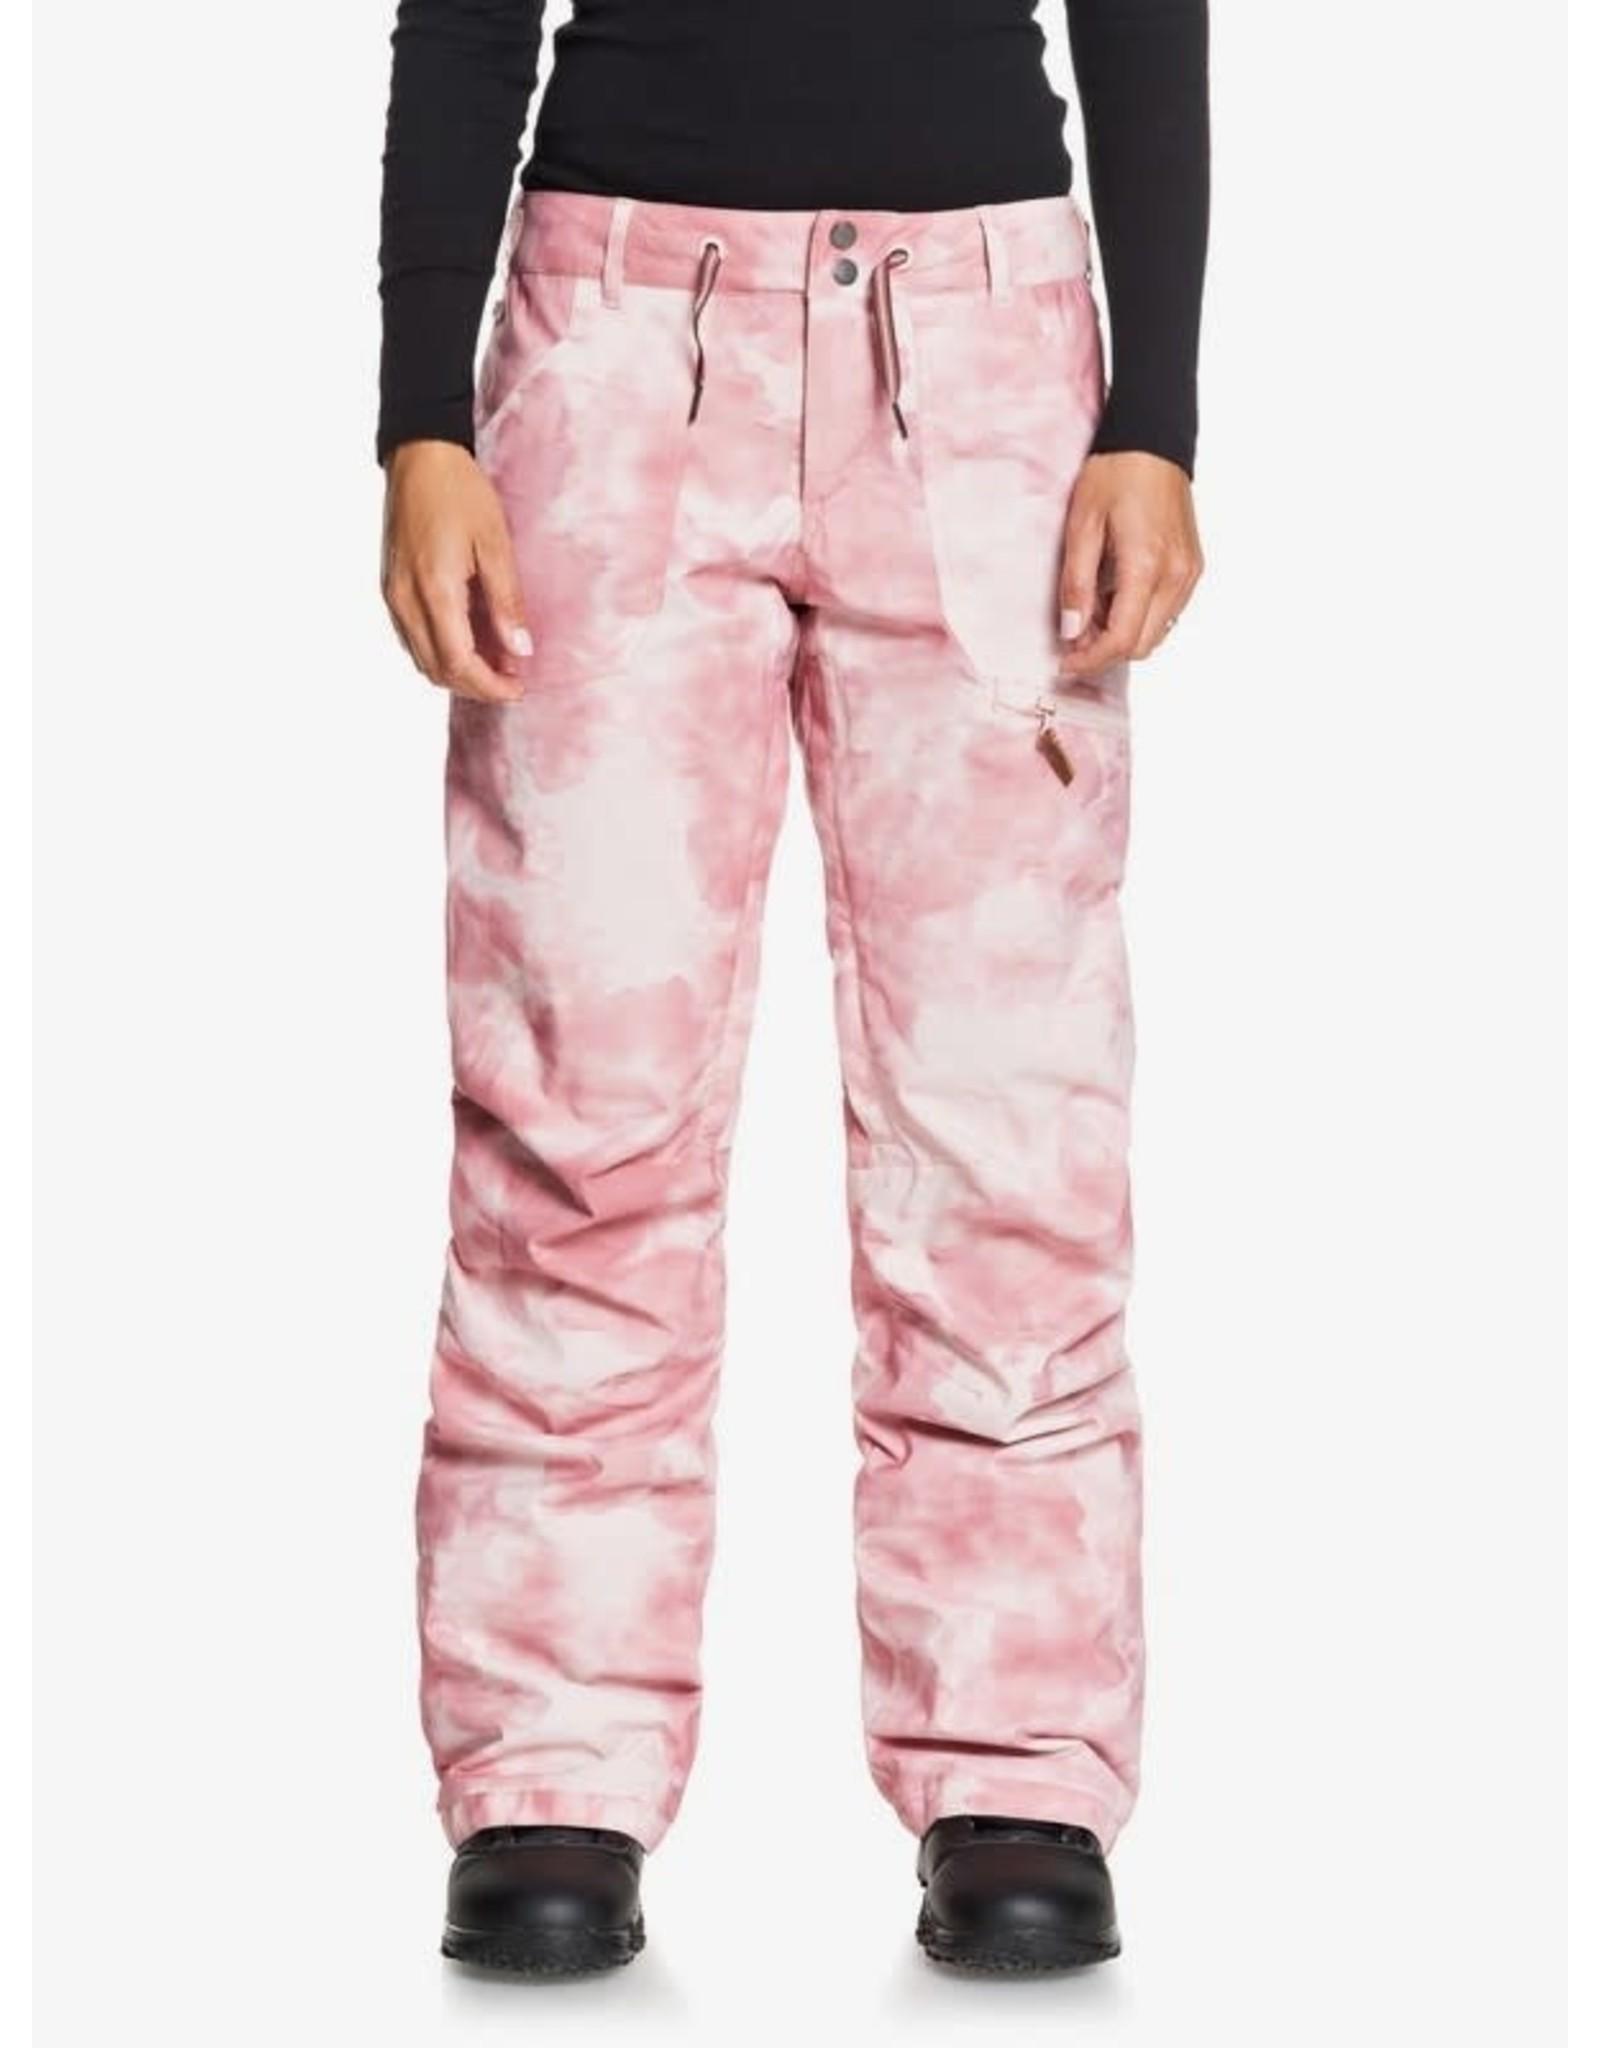 ROXY Nadia Printed Snow Pant